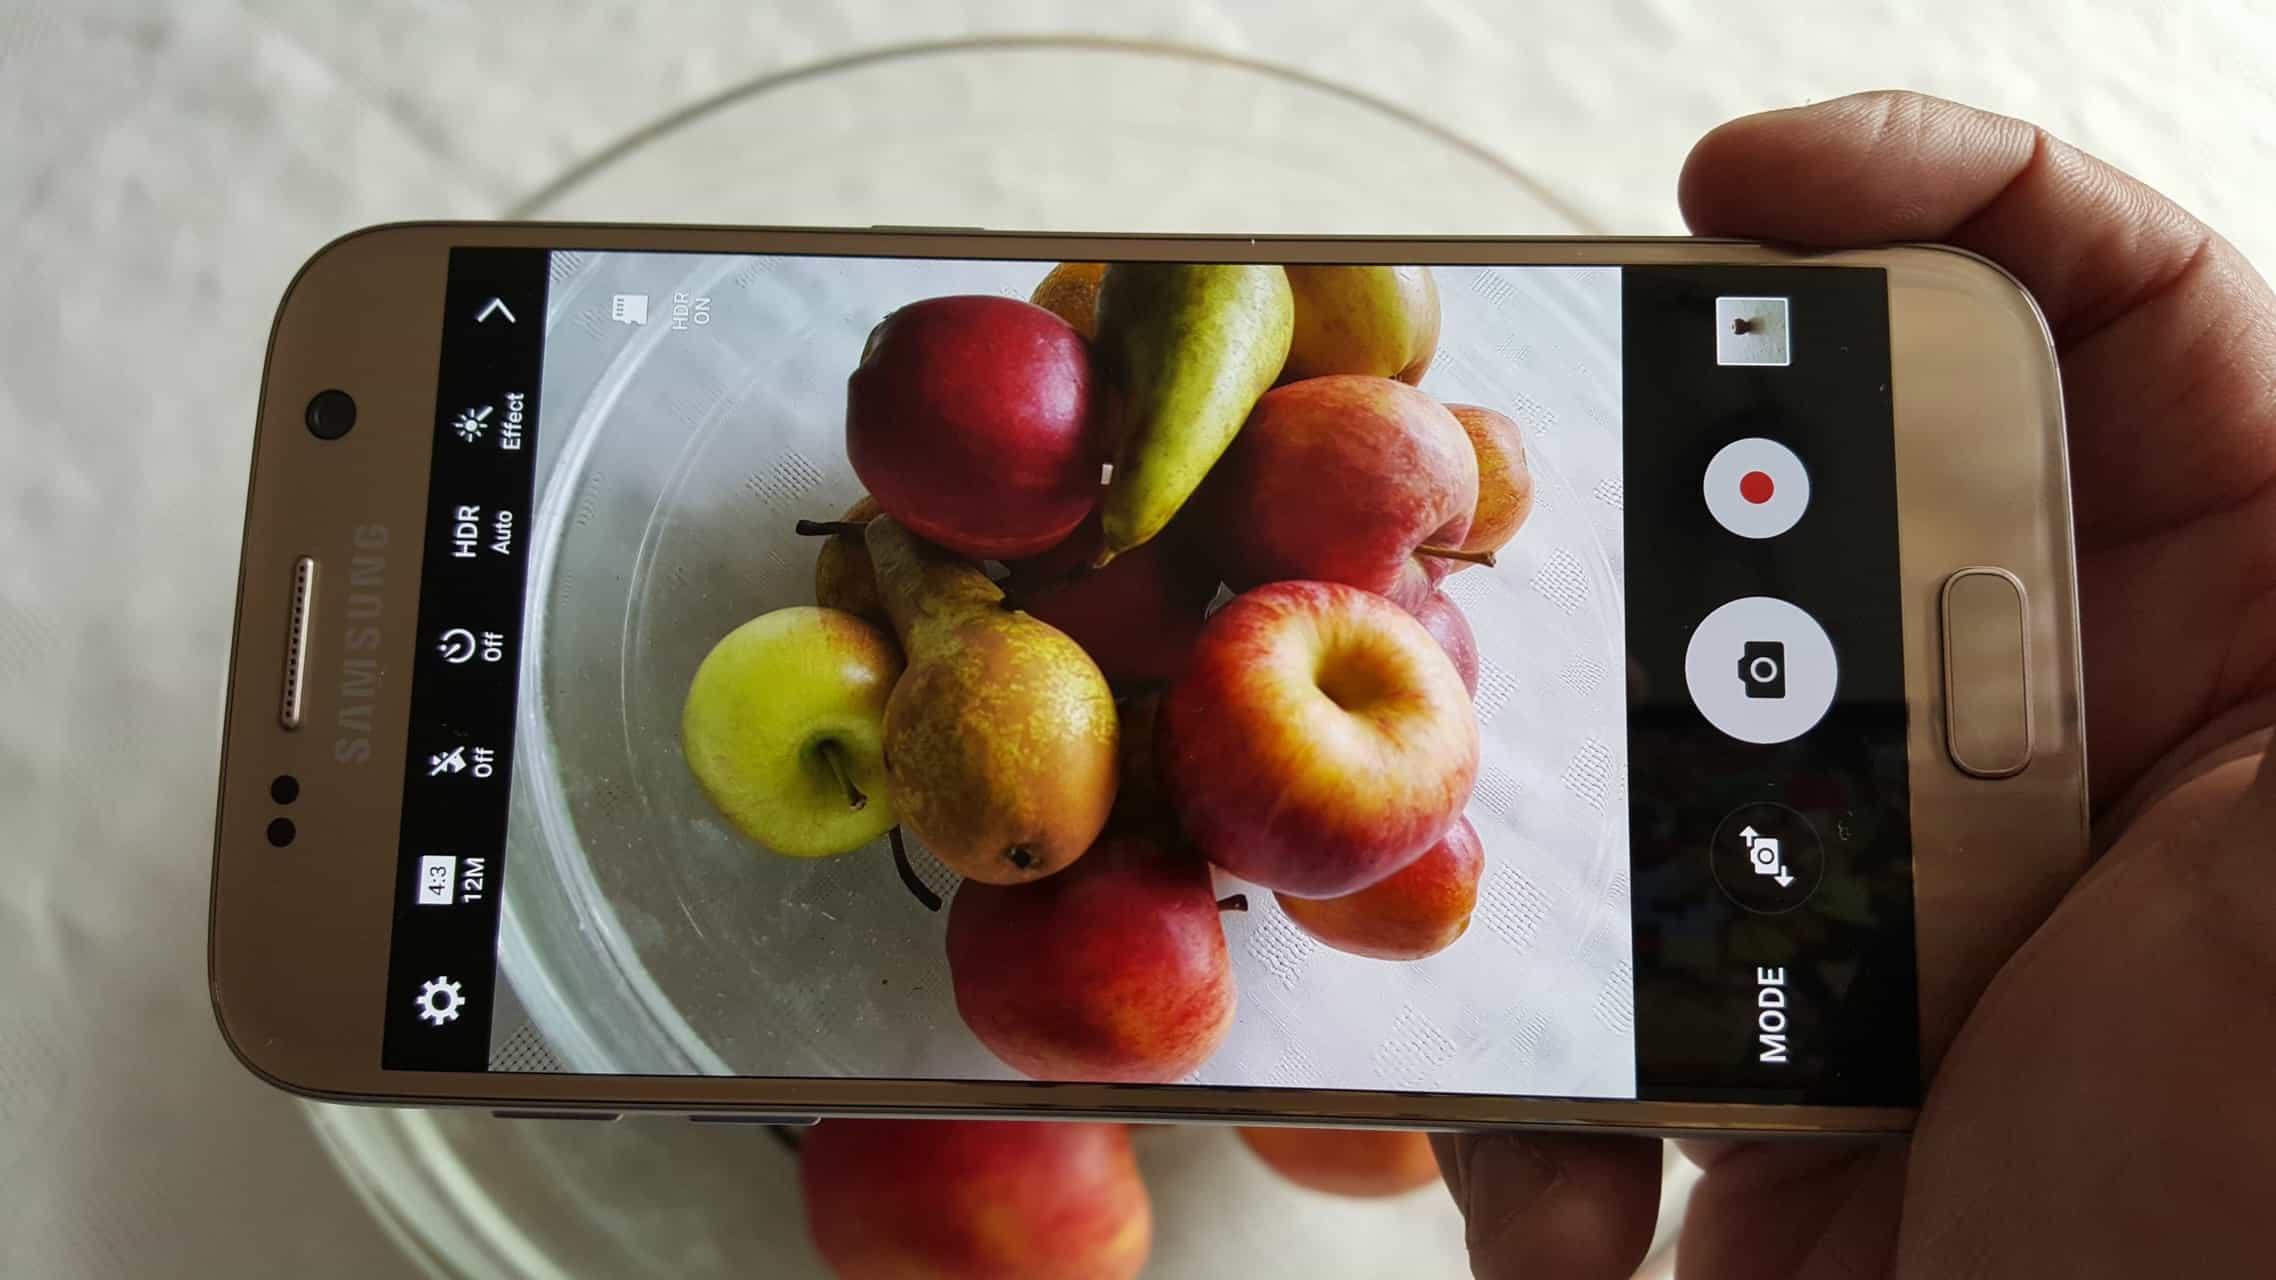 Samsung Galaxy S7 Camera Quick Launch